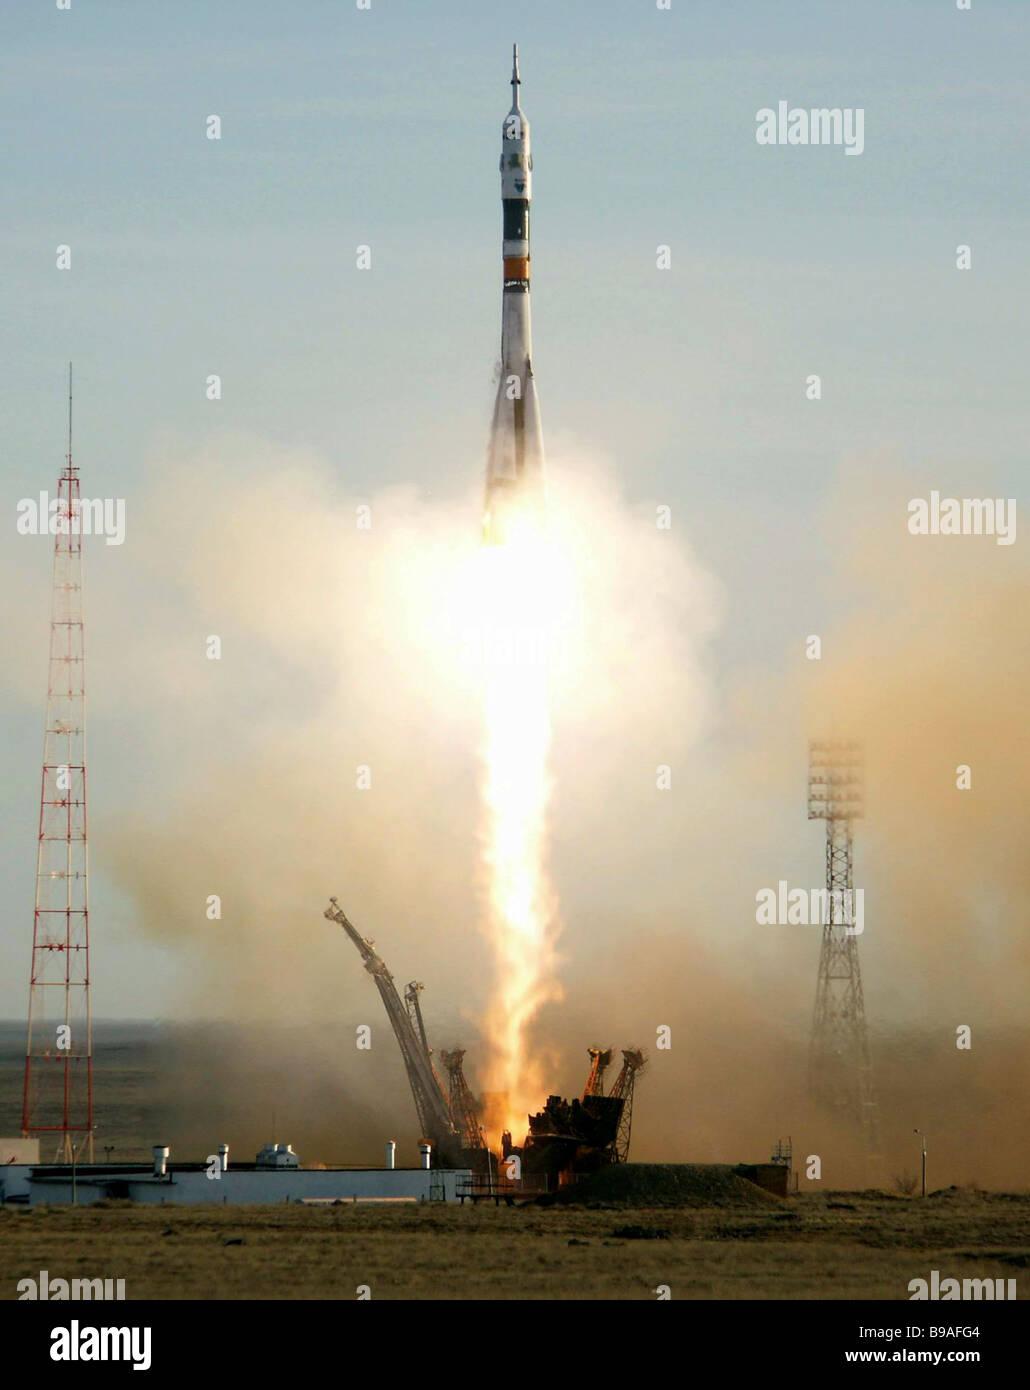 The Russian Soyuz TMA 8 spaceship s blast off from the Baikonur cosmodrome in Kazakhstan Stock Photo